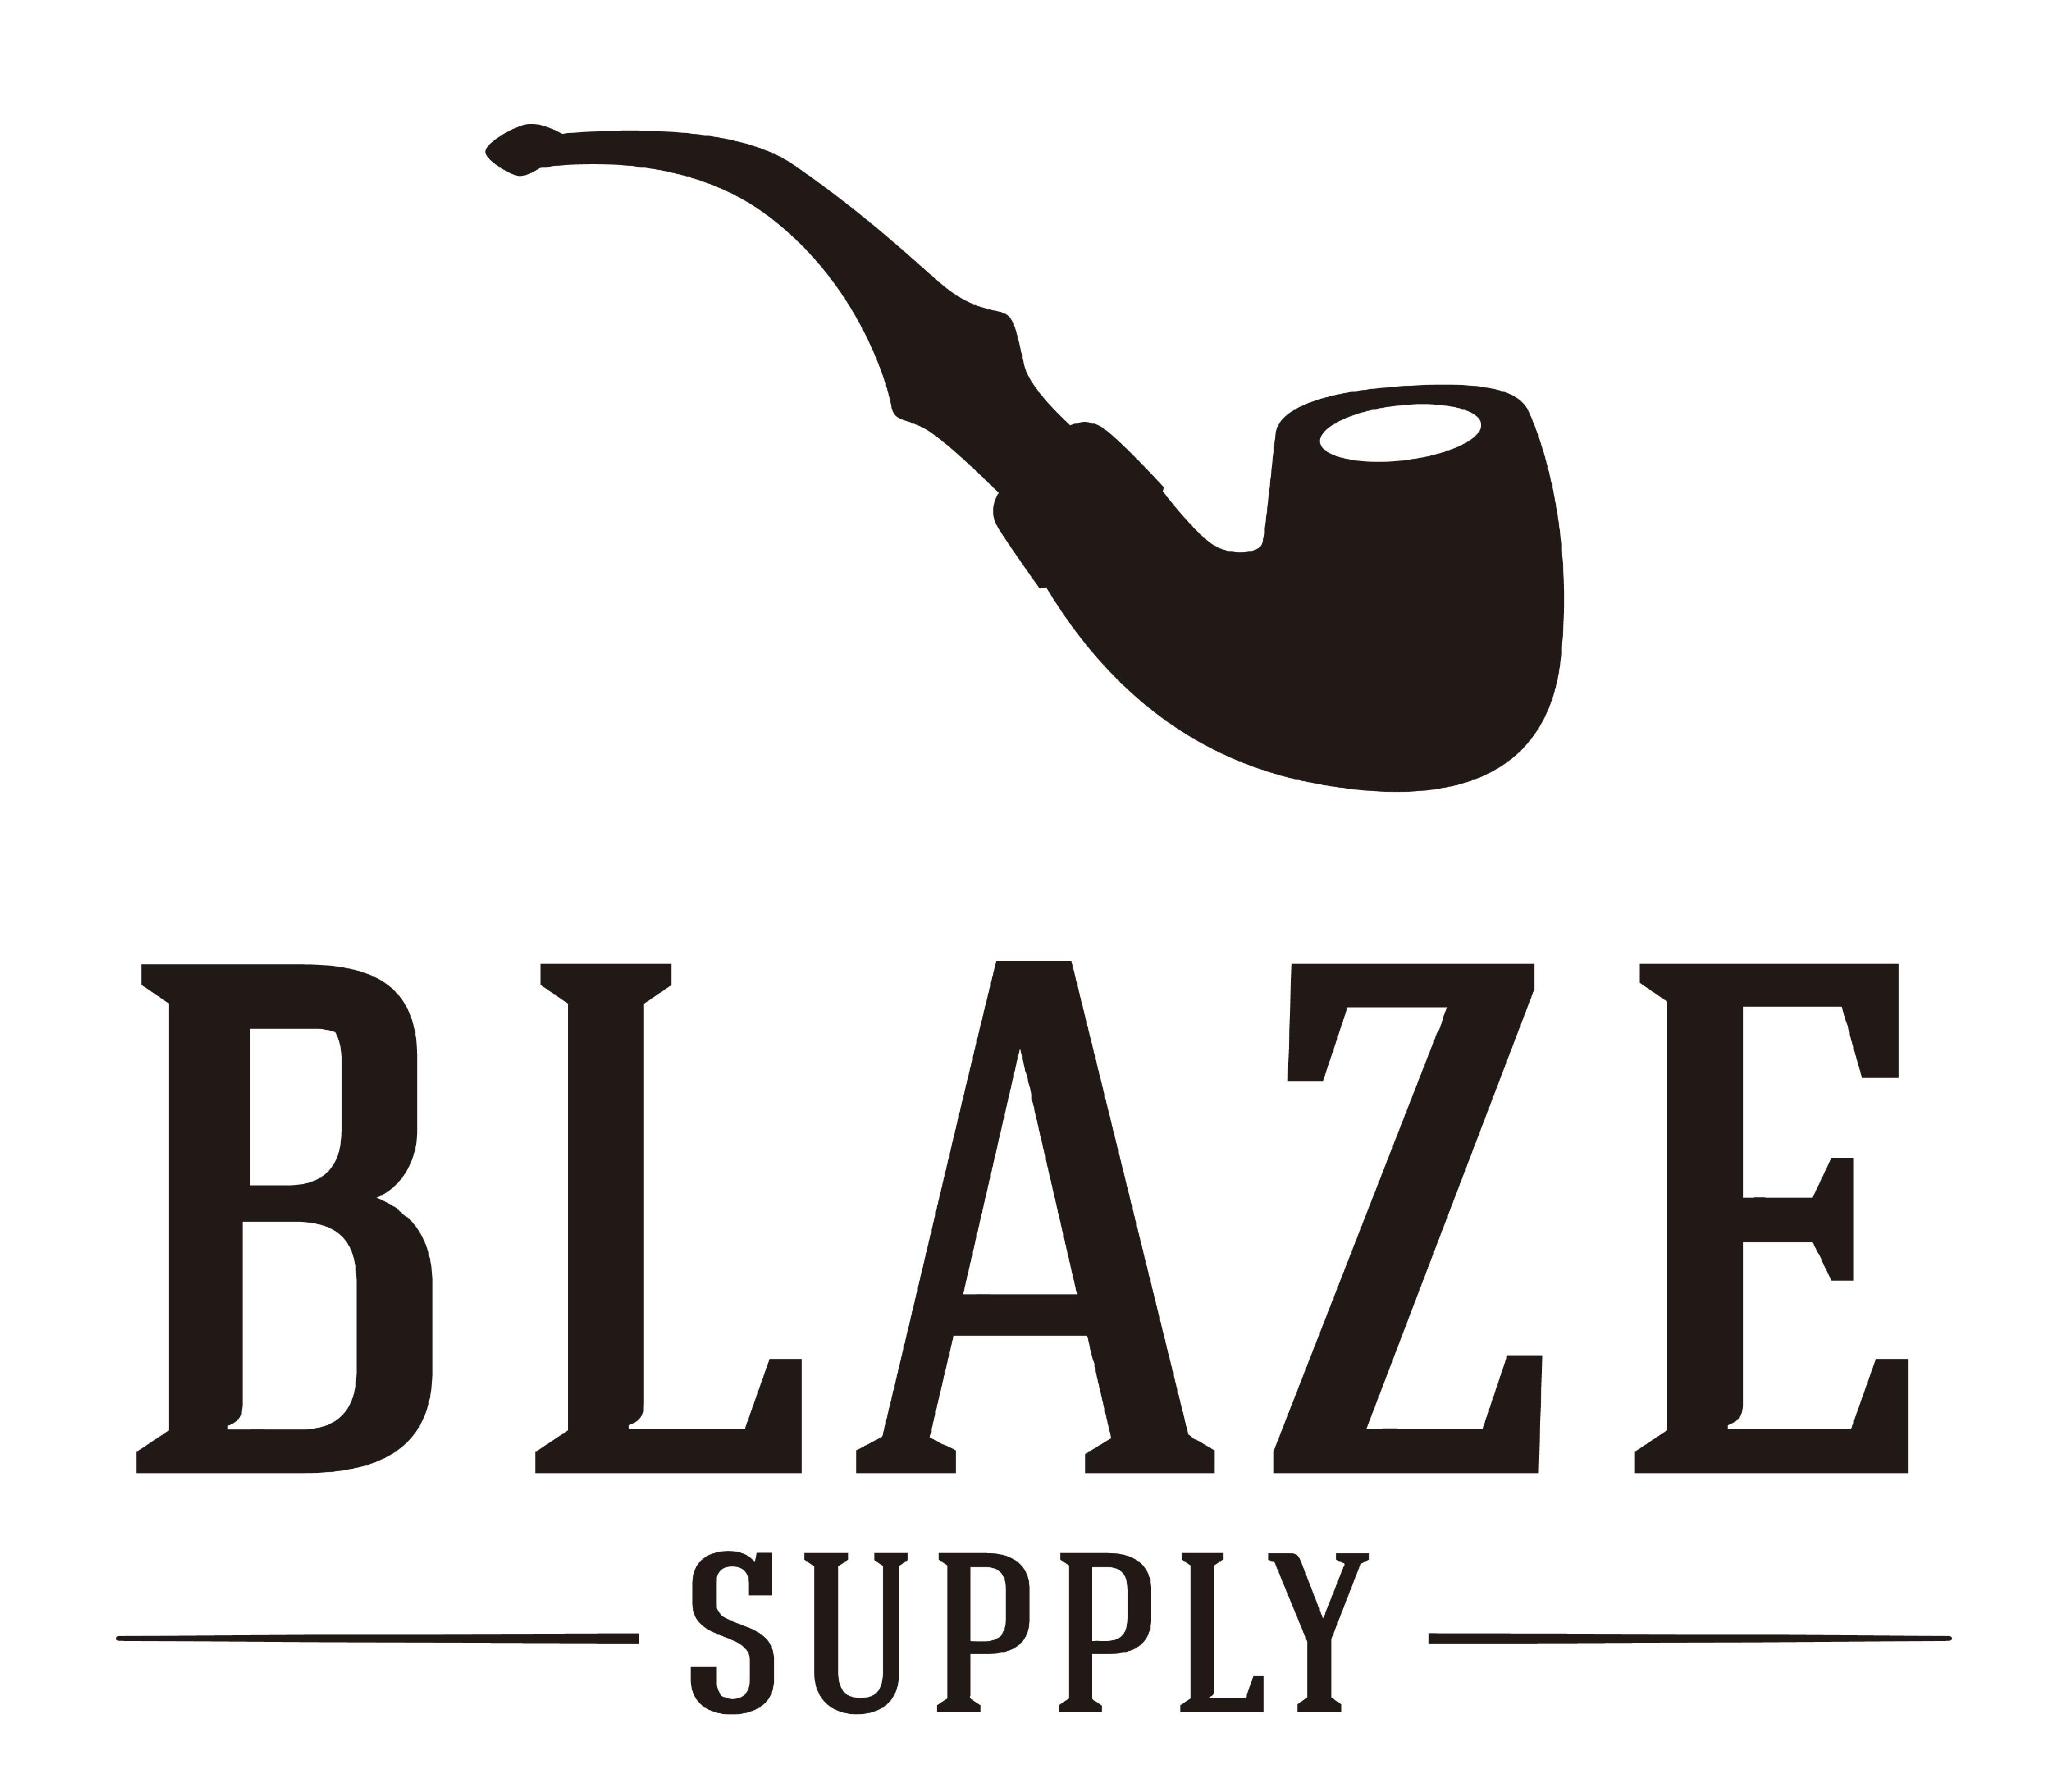 b2414caaf9654 Shop - Blaze Supply